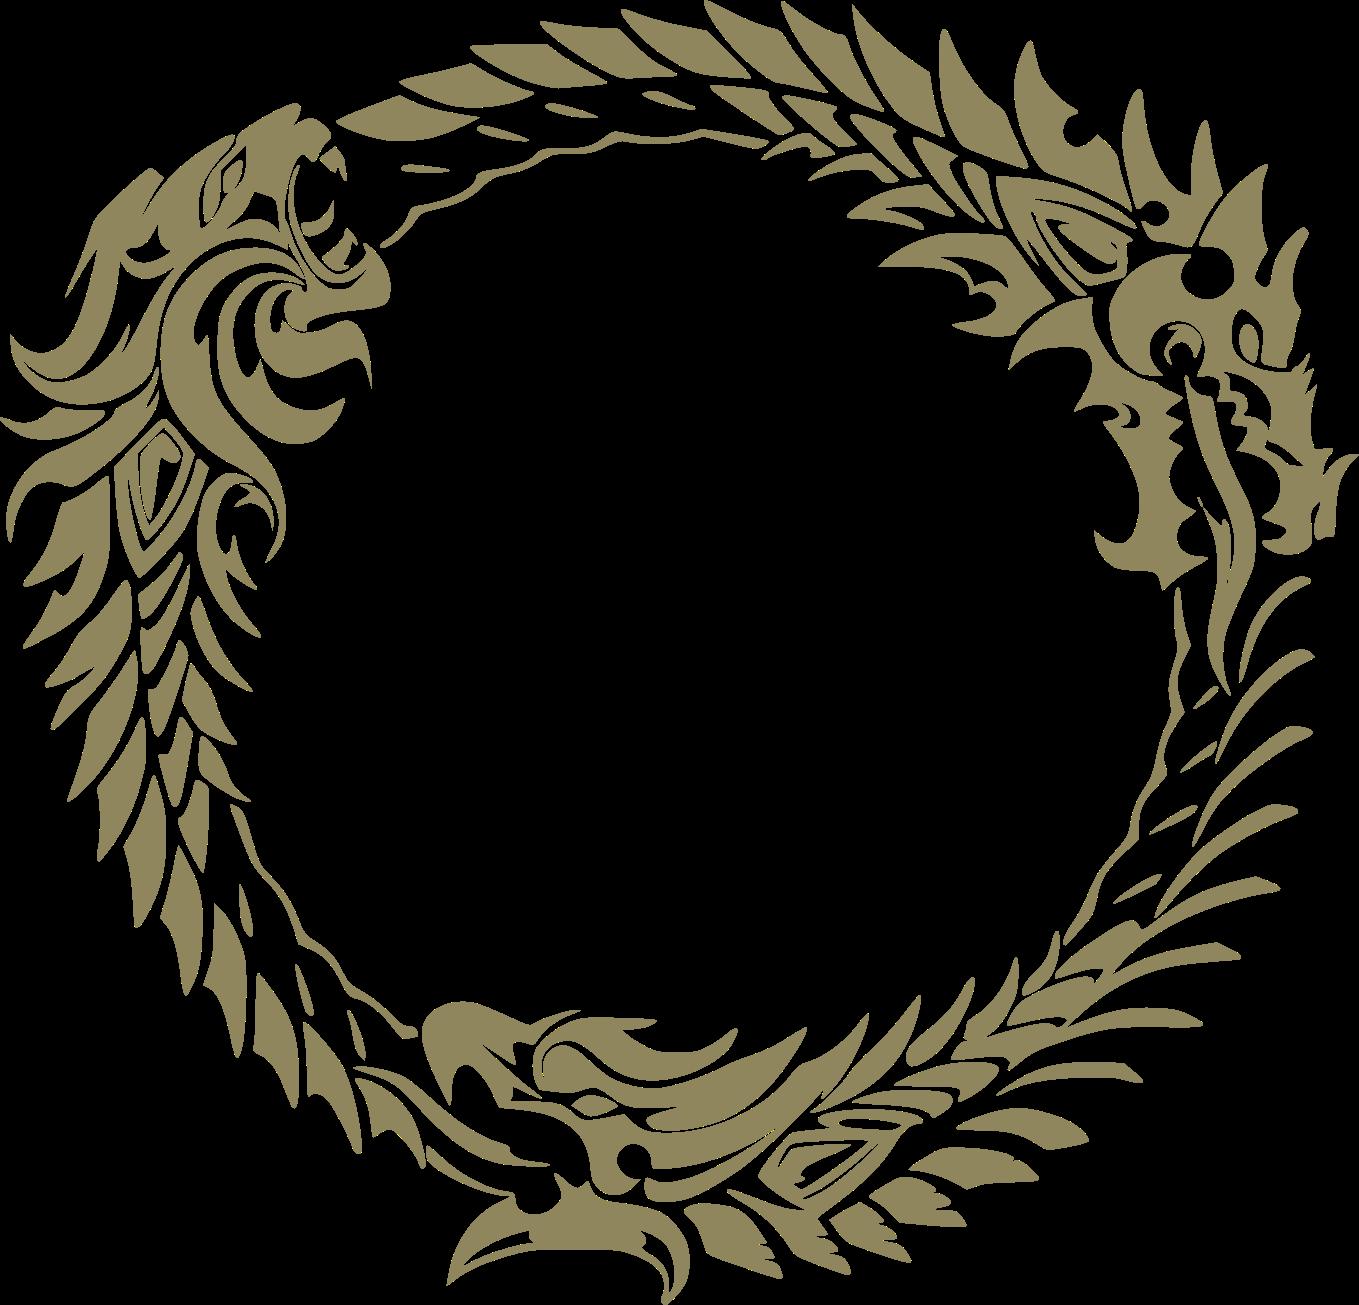 Elder Scrolls Online Subcategory?